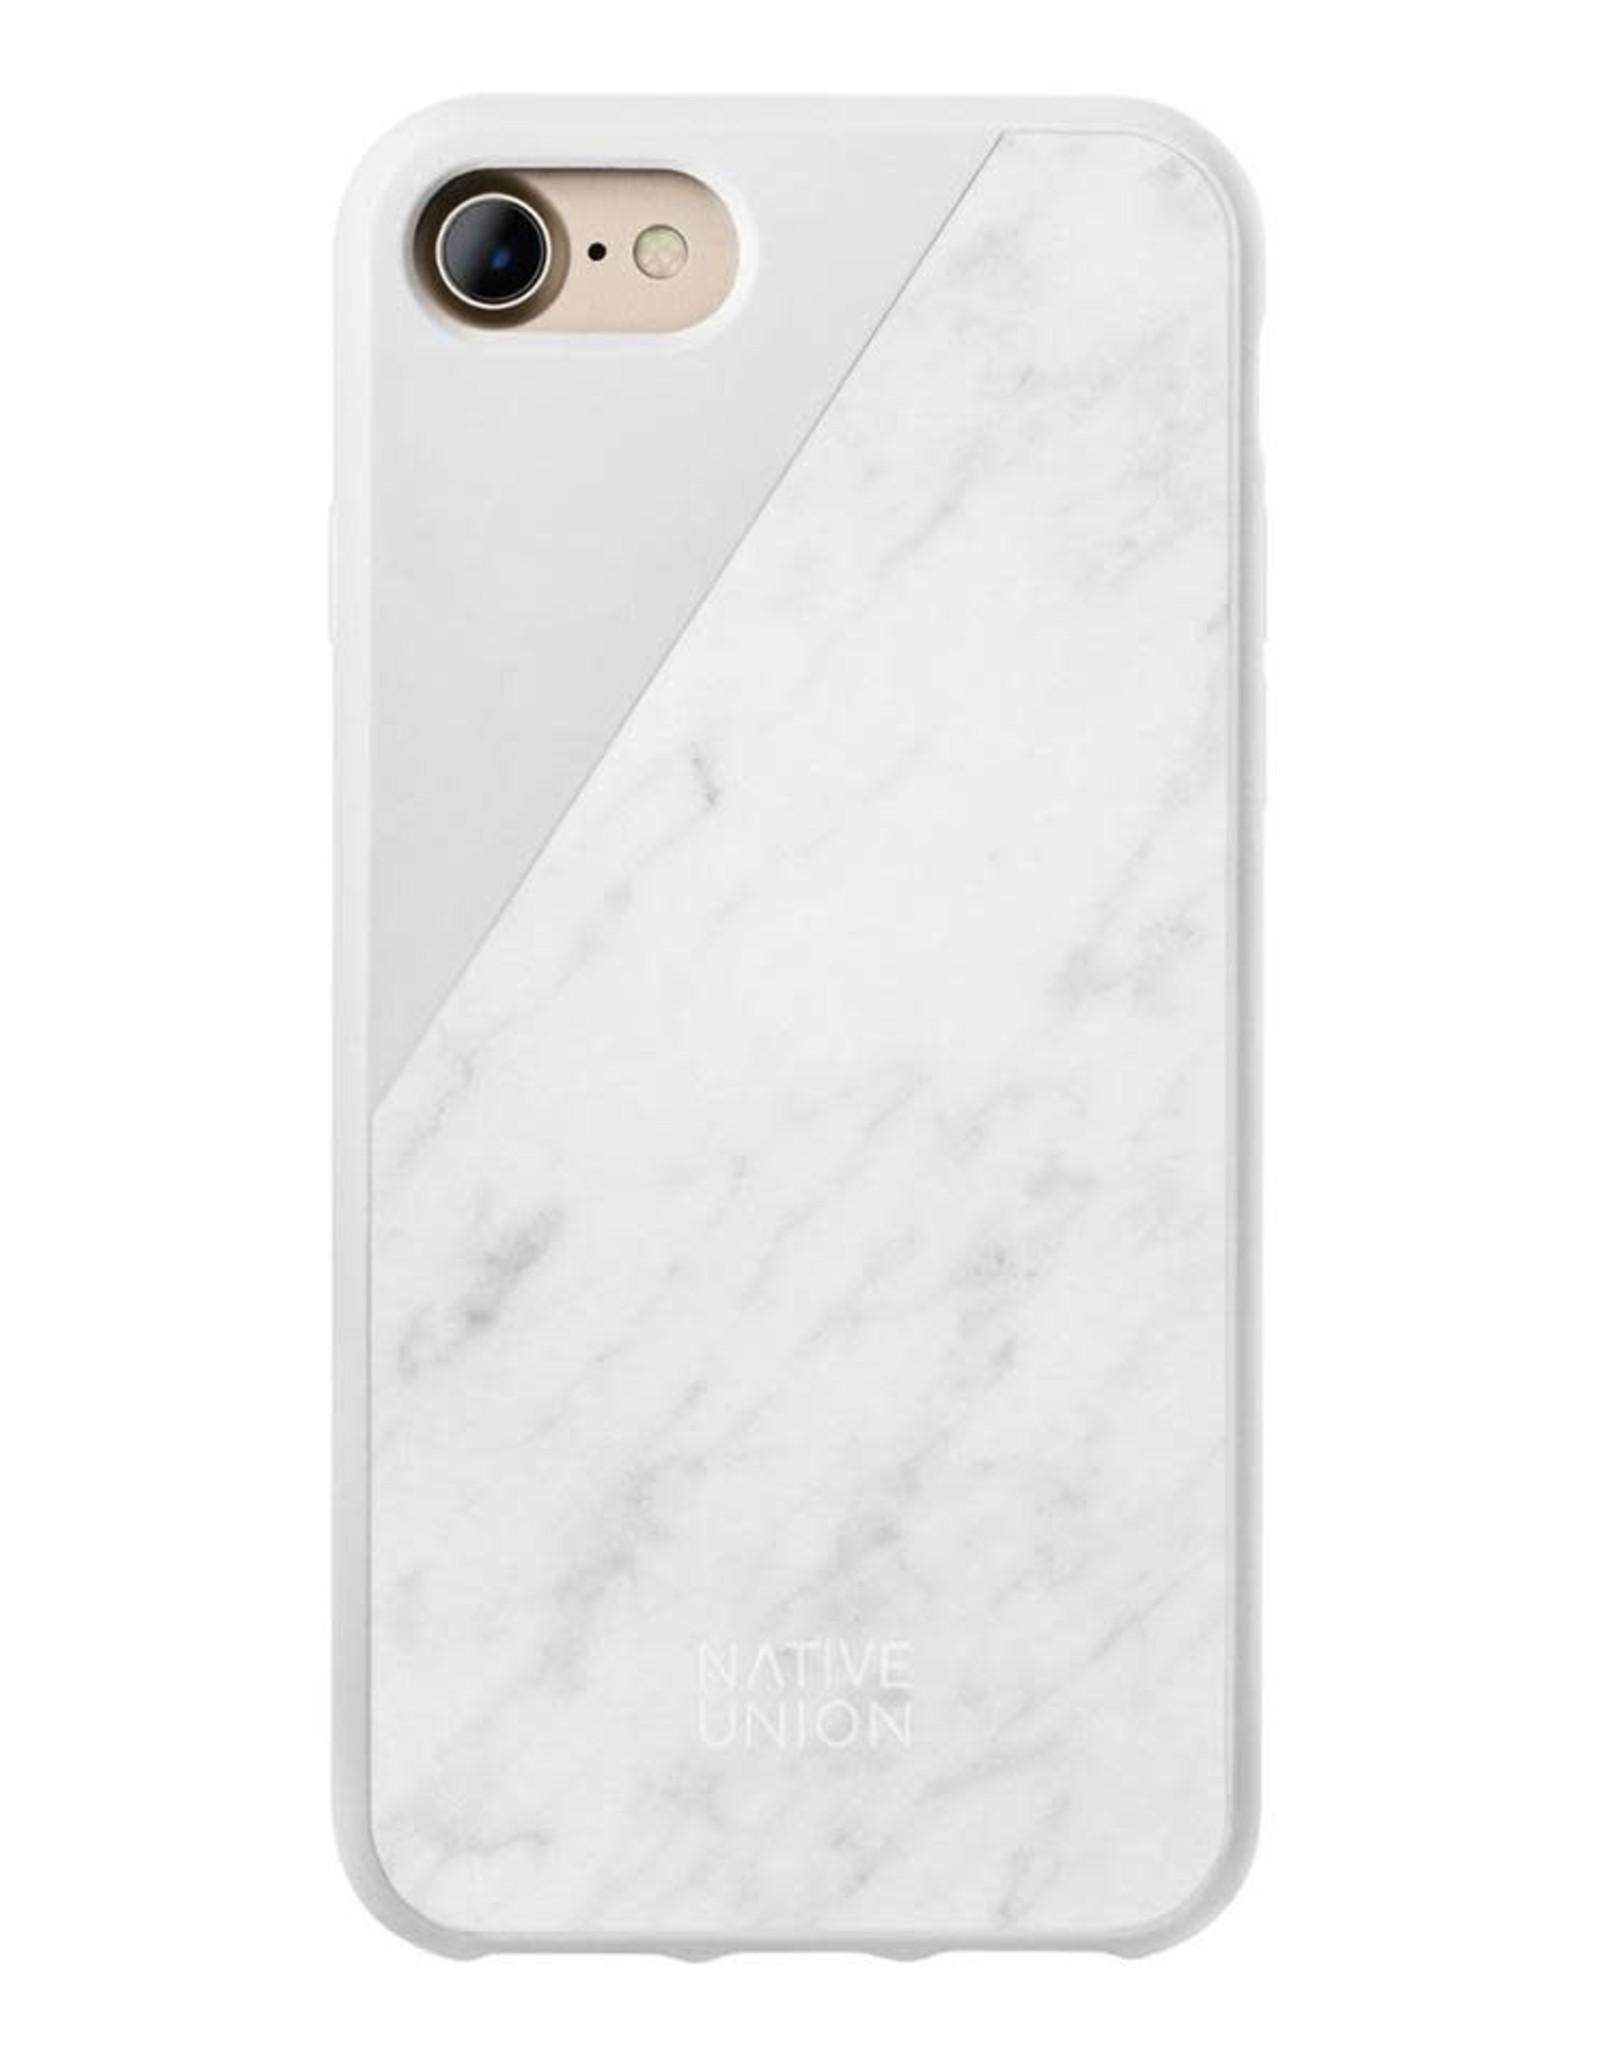 Native Union Native Union   iPhone 8/7/6/6s+ Clic Marble White/Gold   CLIC-WHT-MBMT-7P